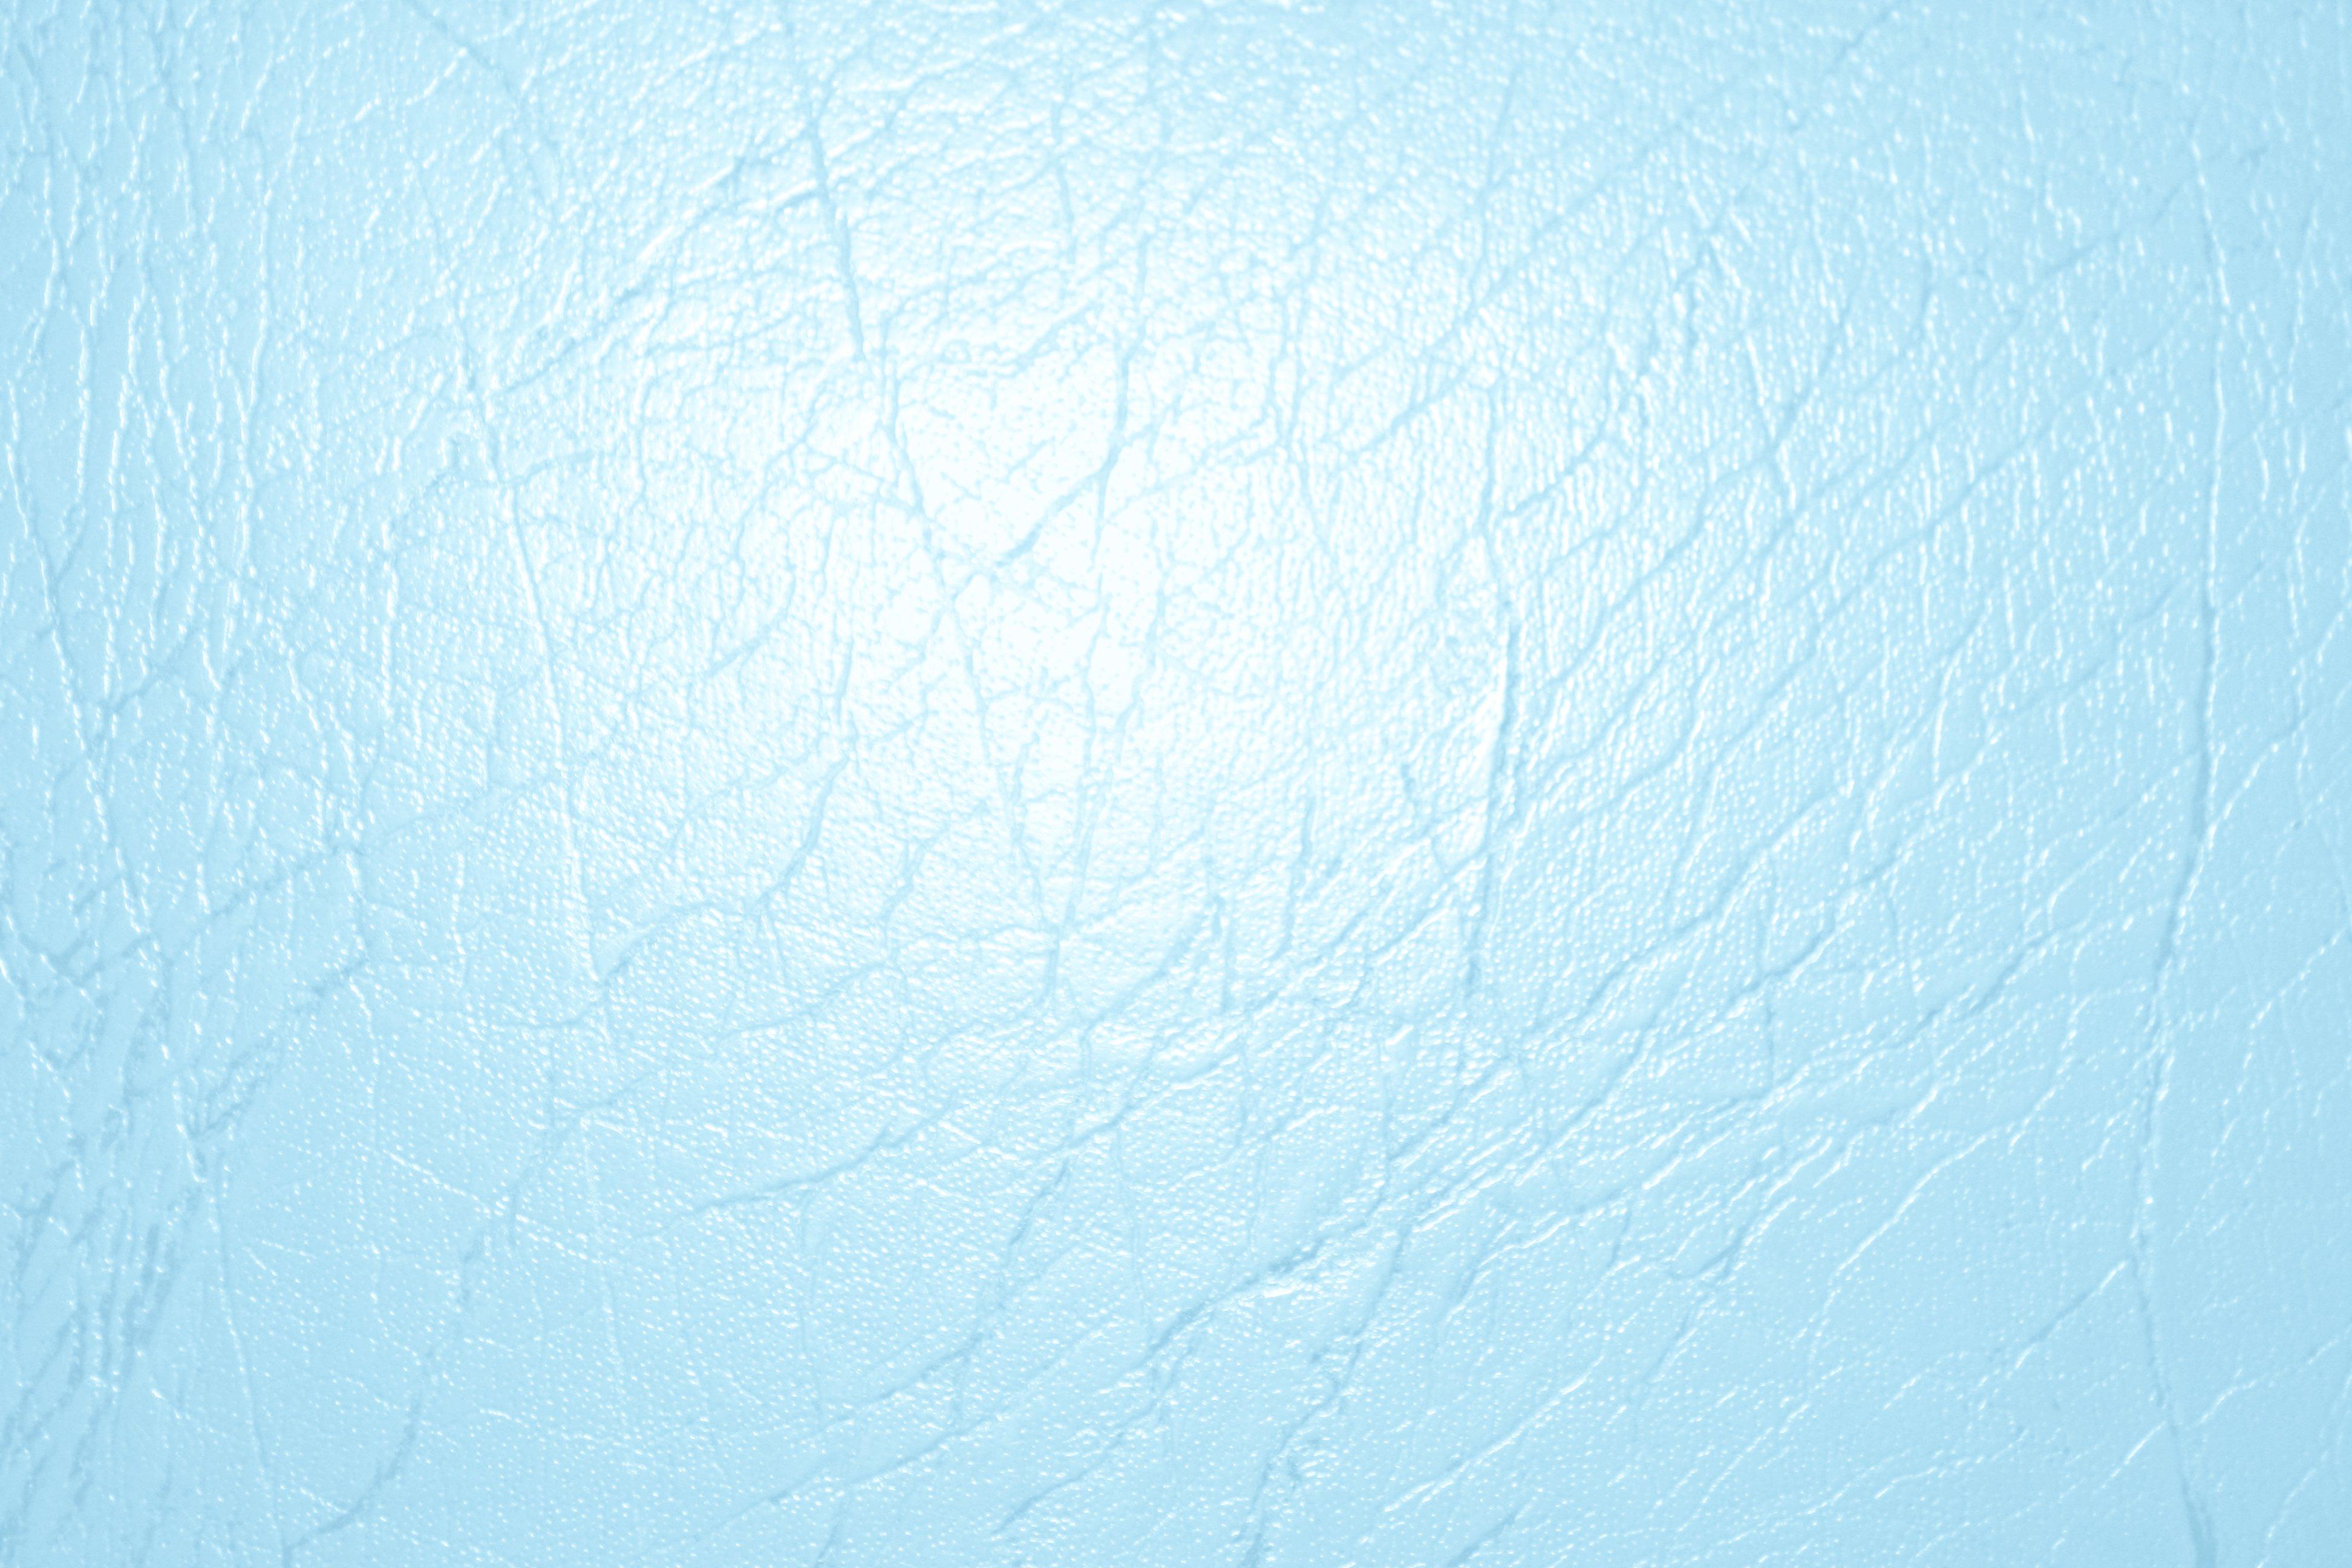 Baby Blue Leather Texture Picture Photograph Photos Public 3888x2592